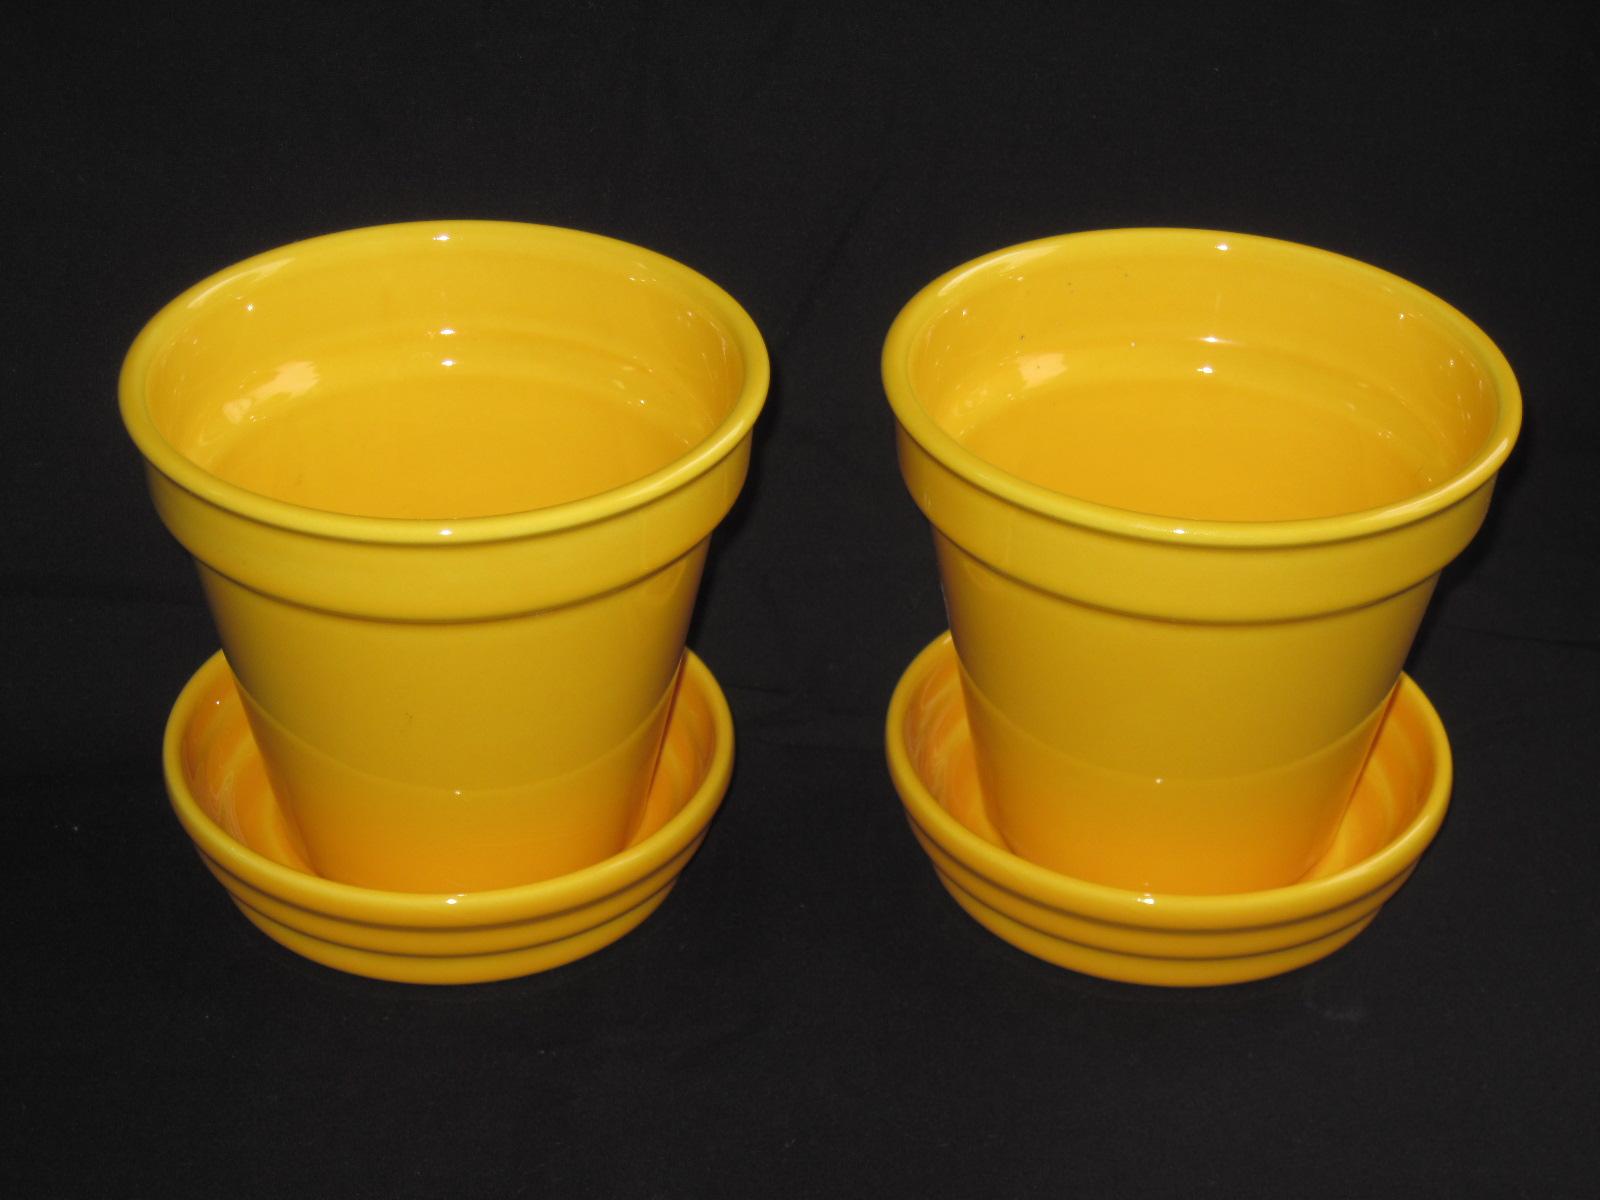 Yellow flower pot fabfindsblog img8537 mightylinksfo